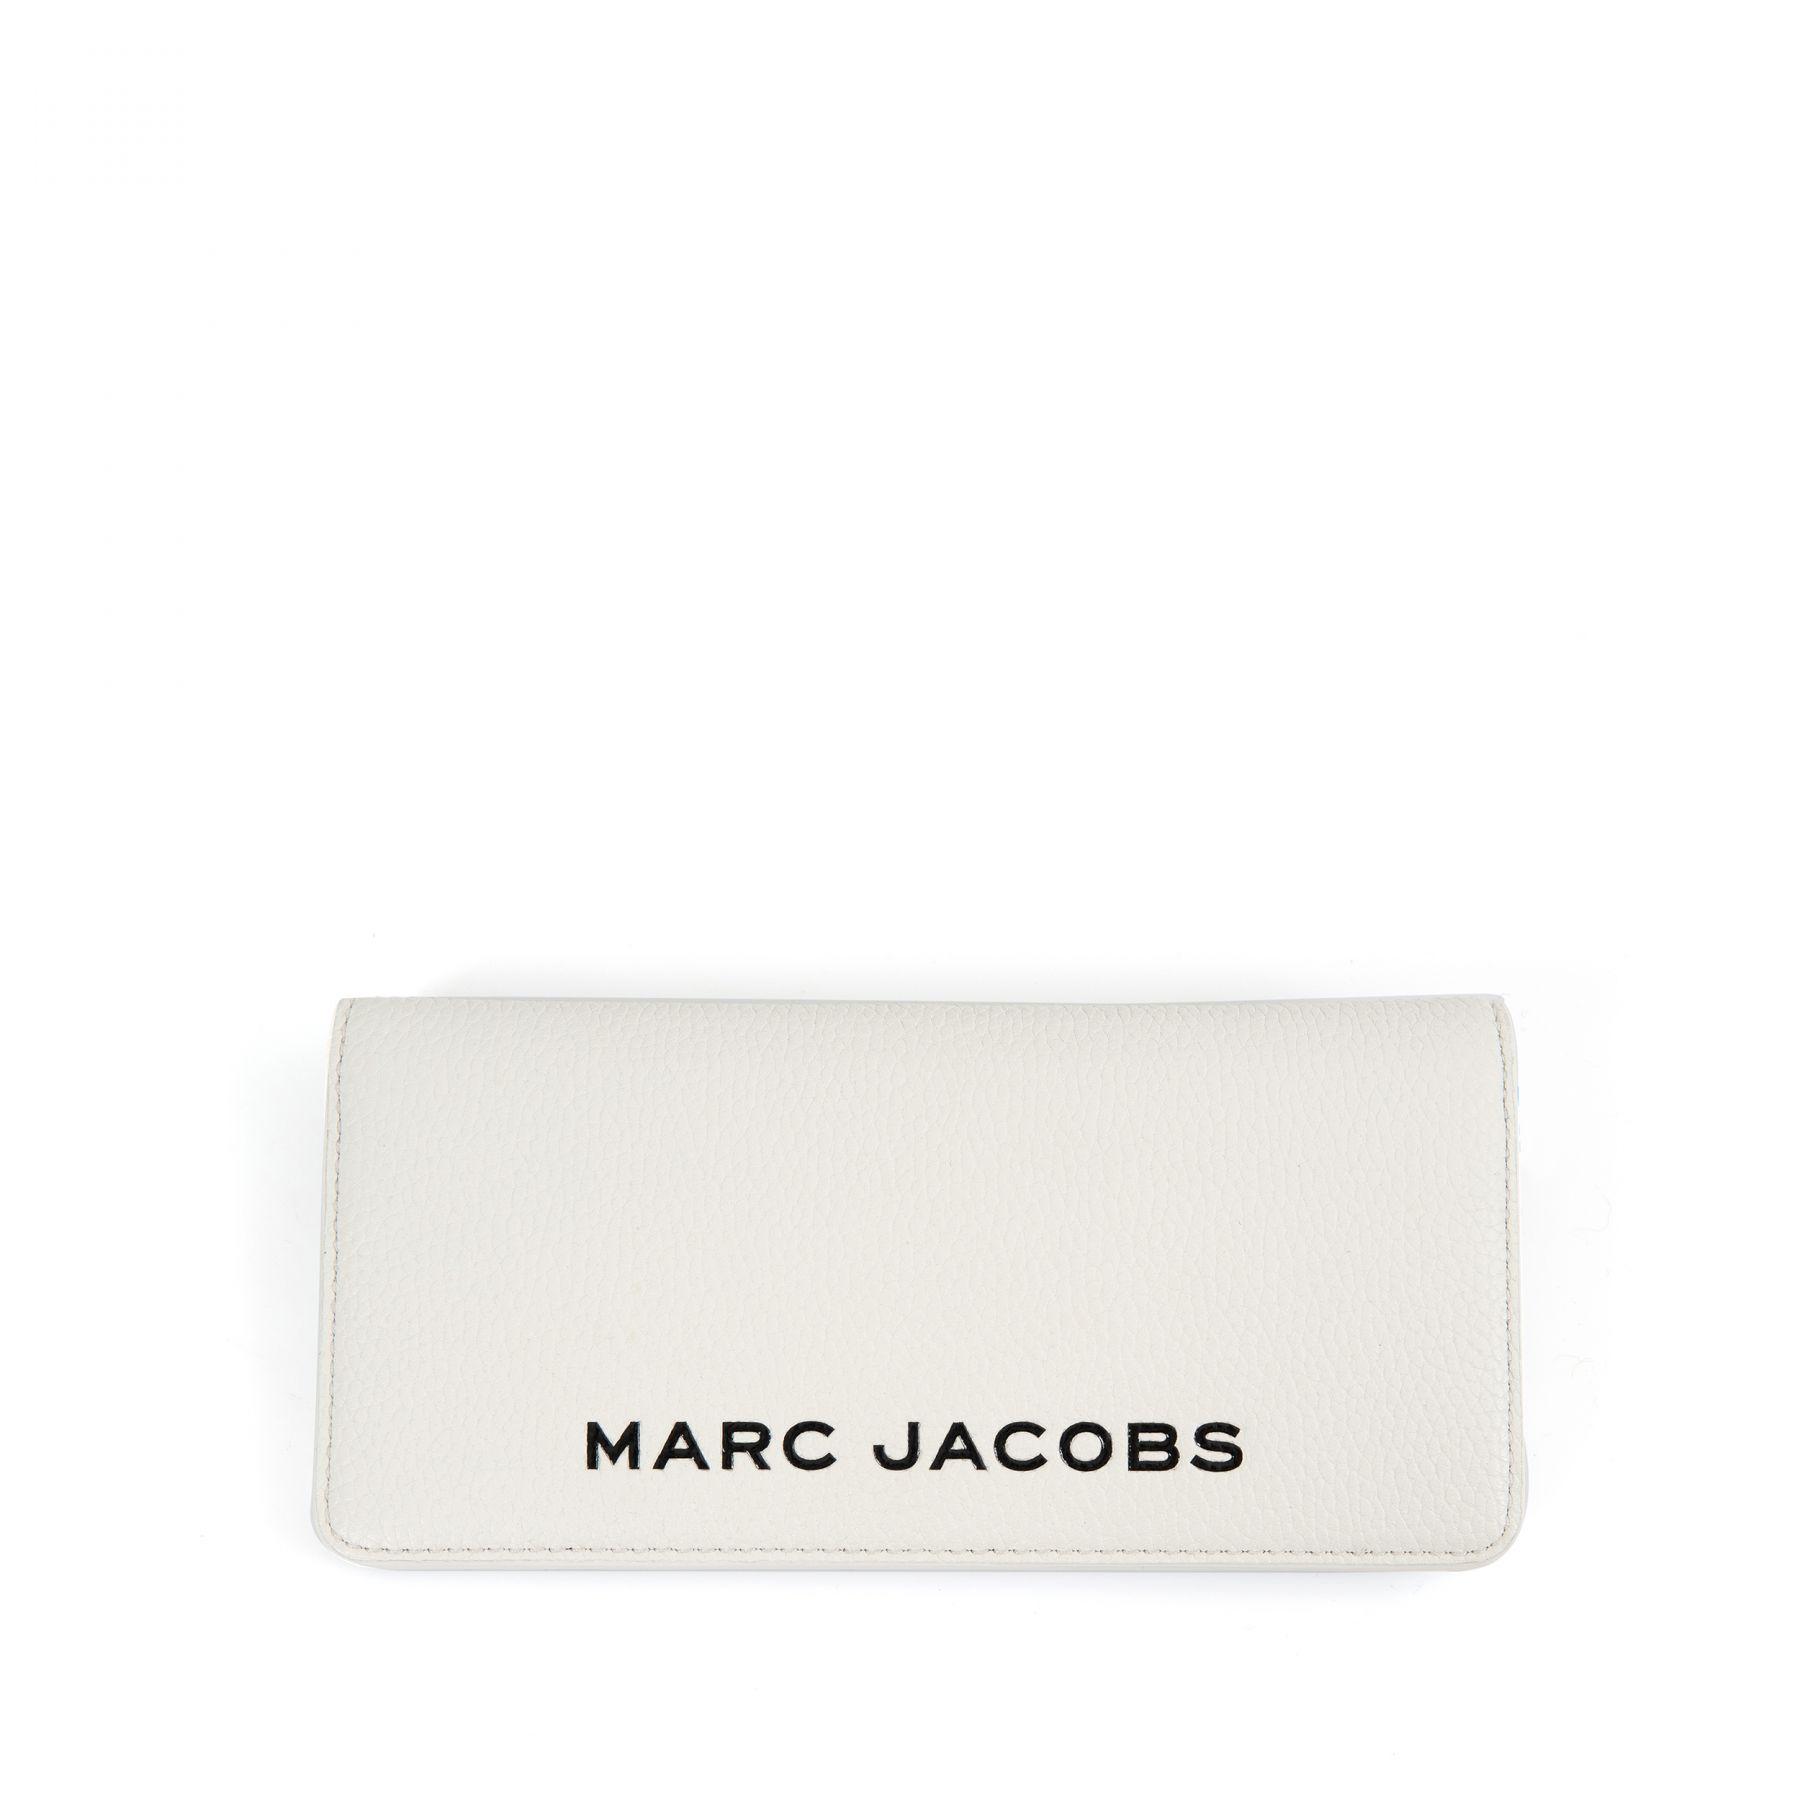 Портмоне Marc Jacobs THE COLORBLOCK OPEN FACE белое